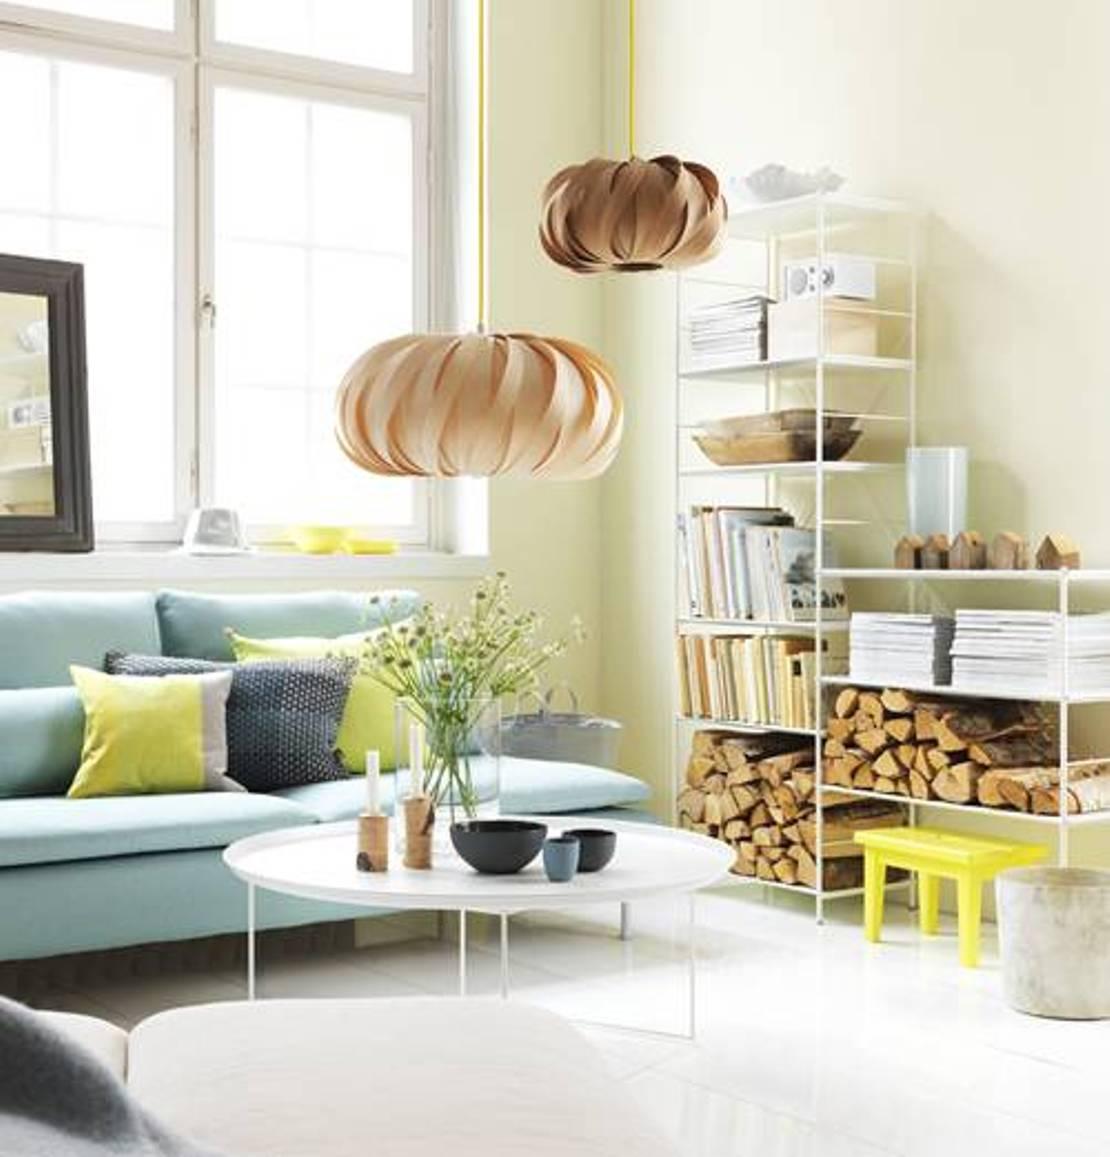 Gabungan warna pastel lembut untuk ruang tamu yang lebih menarik